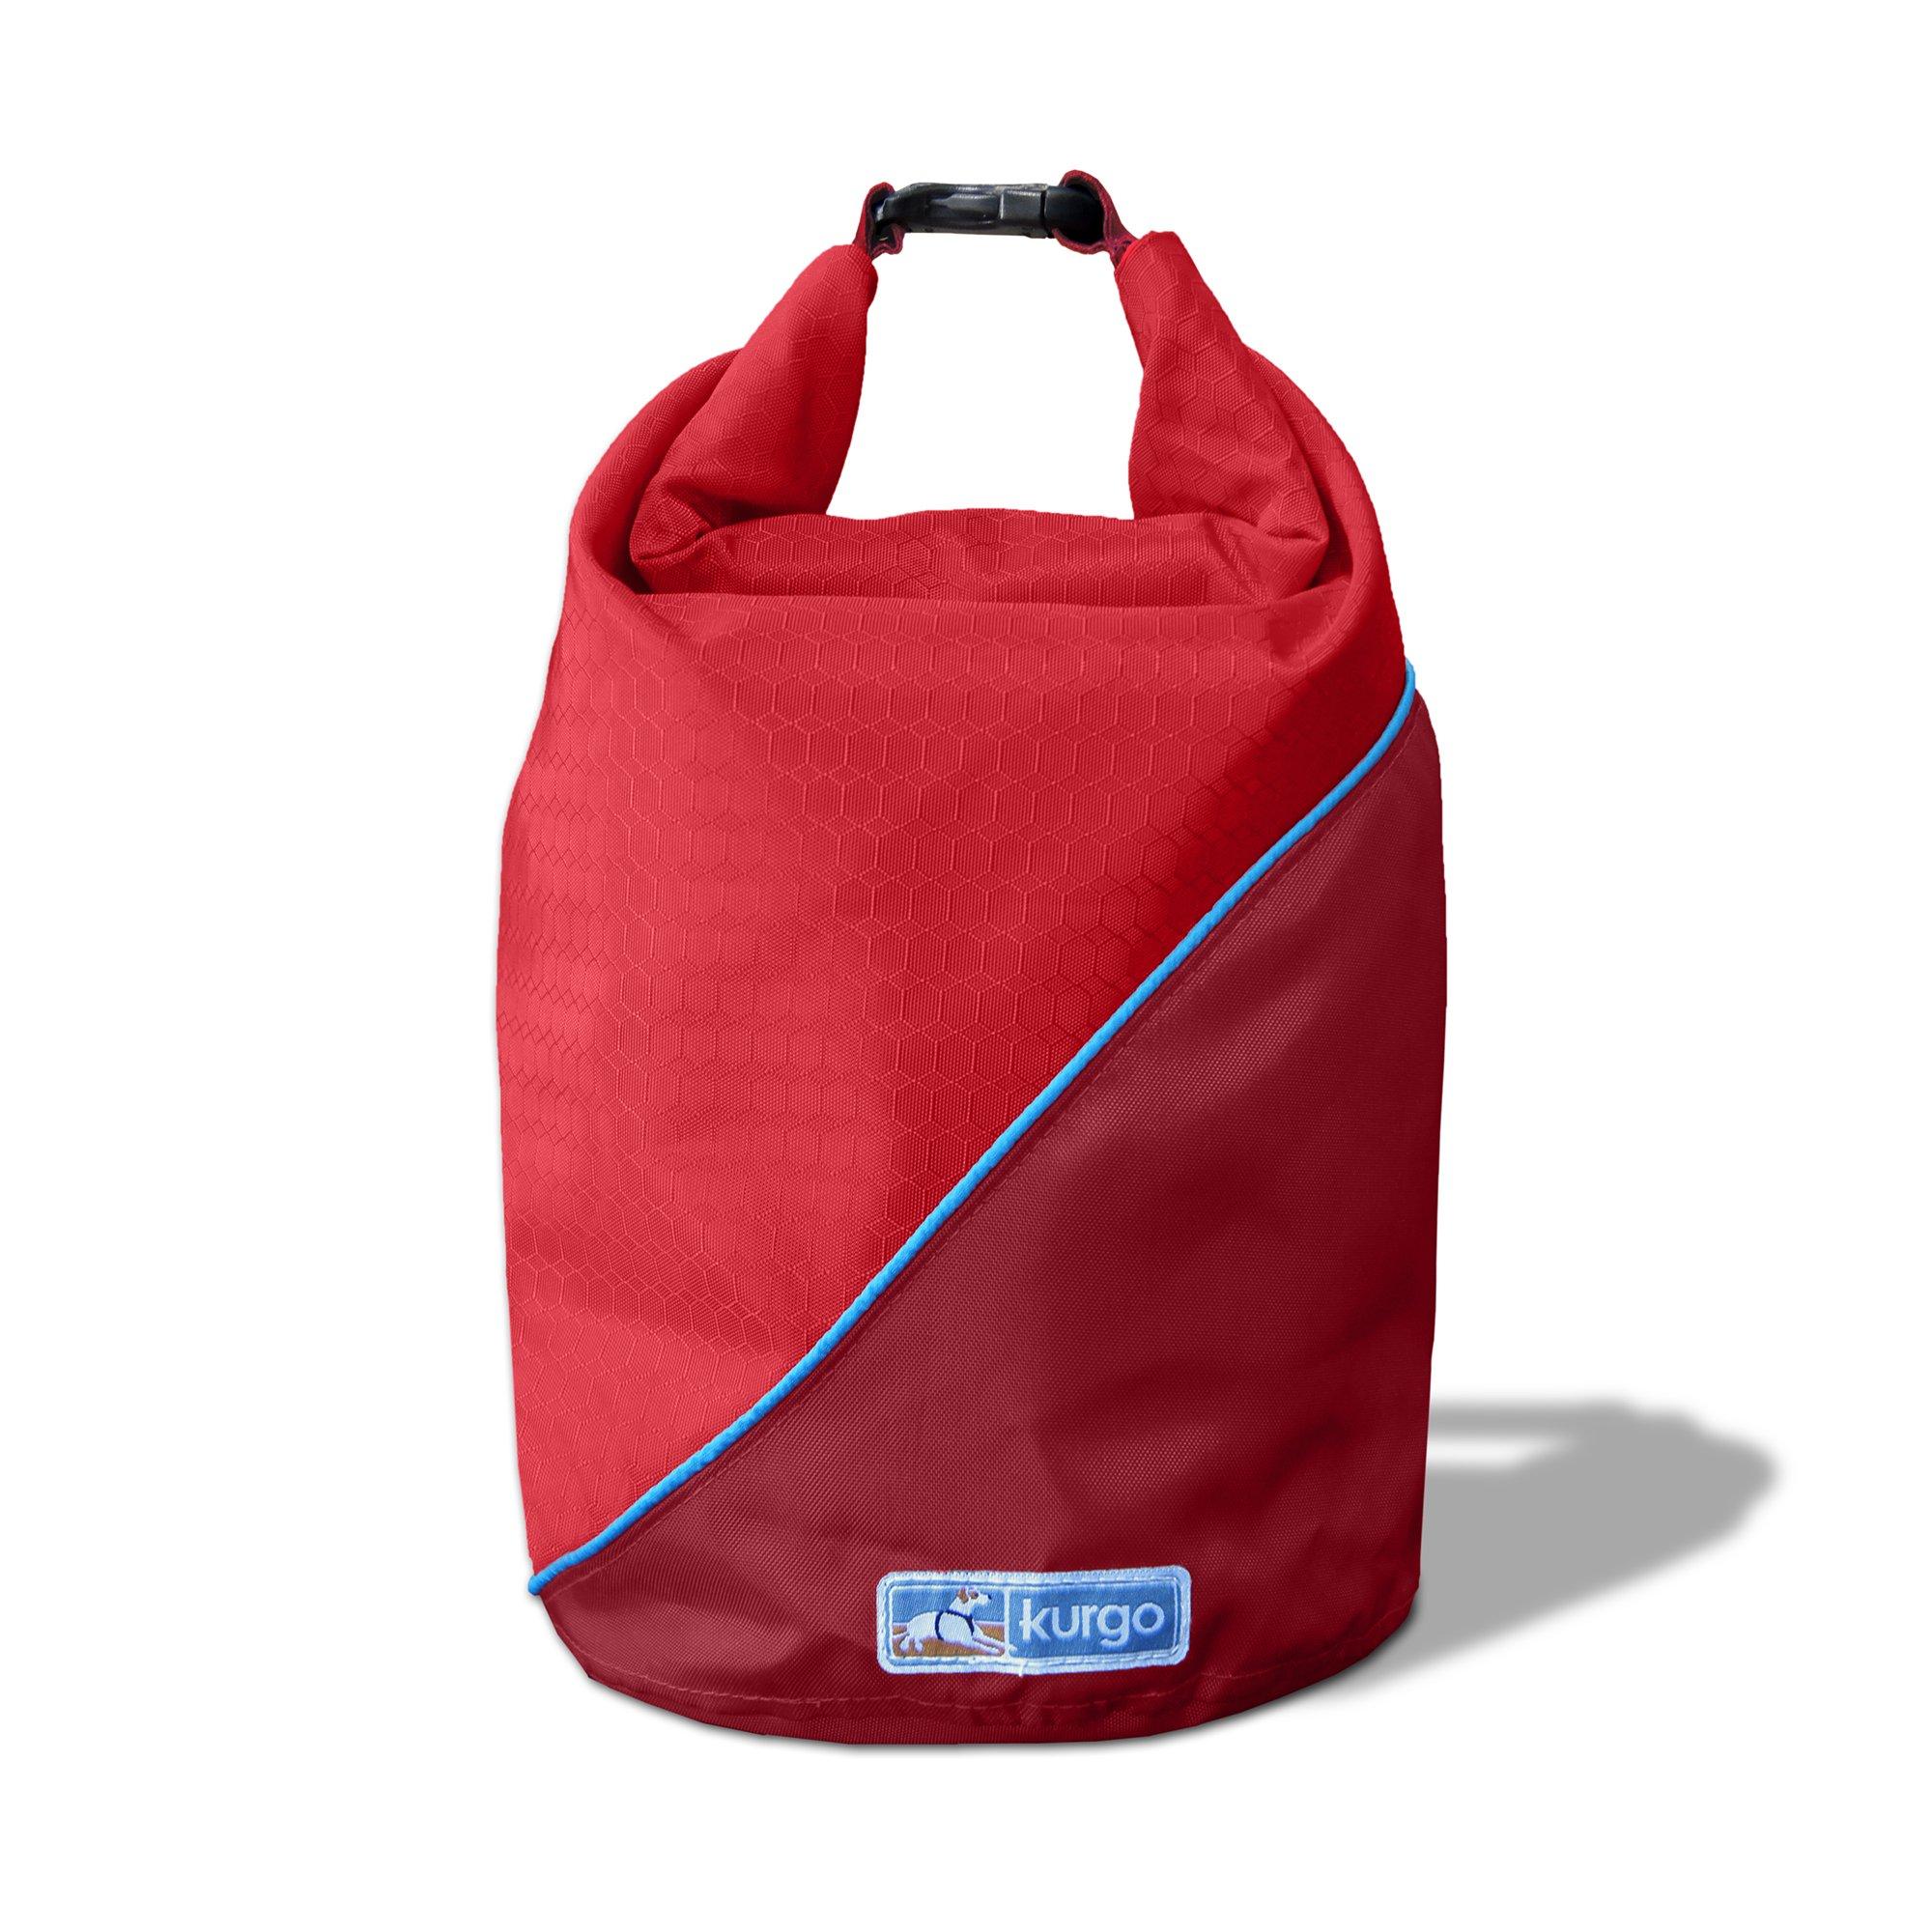 Kurgo Kibble Carrier(TM) Travel Dog Food Bag